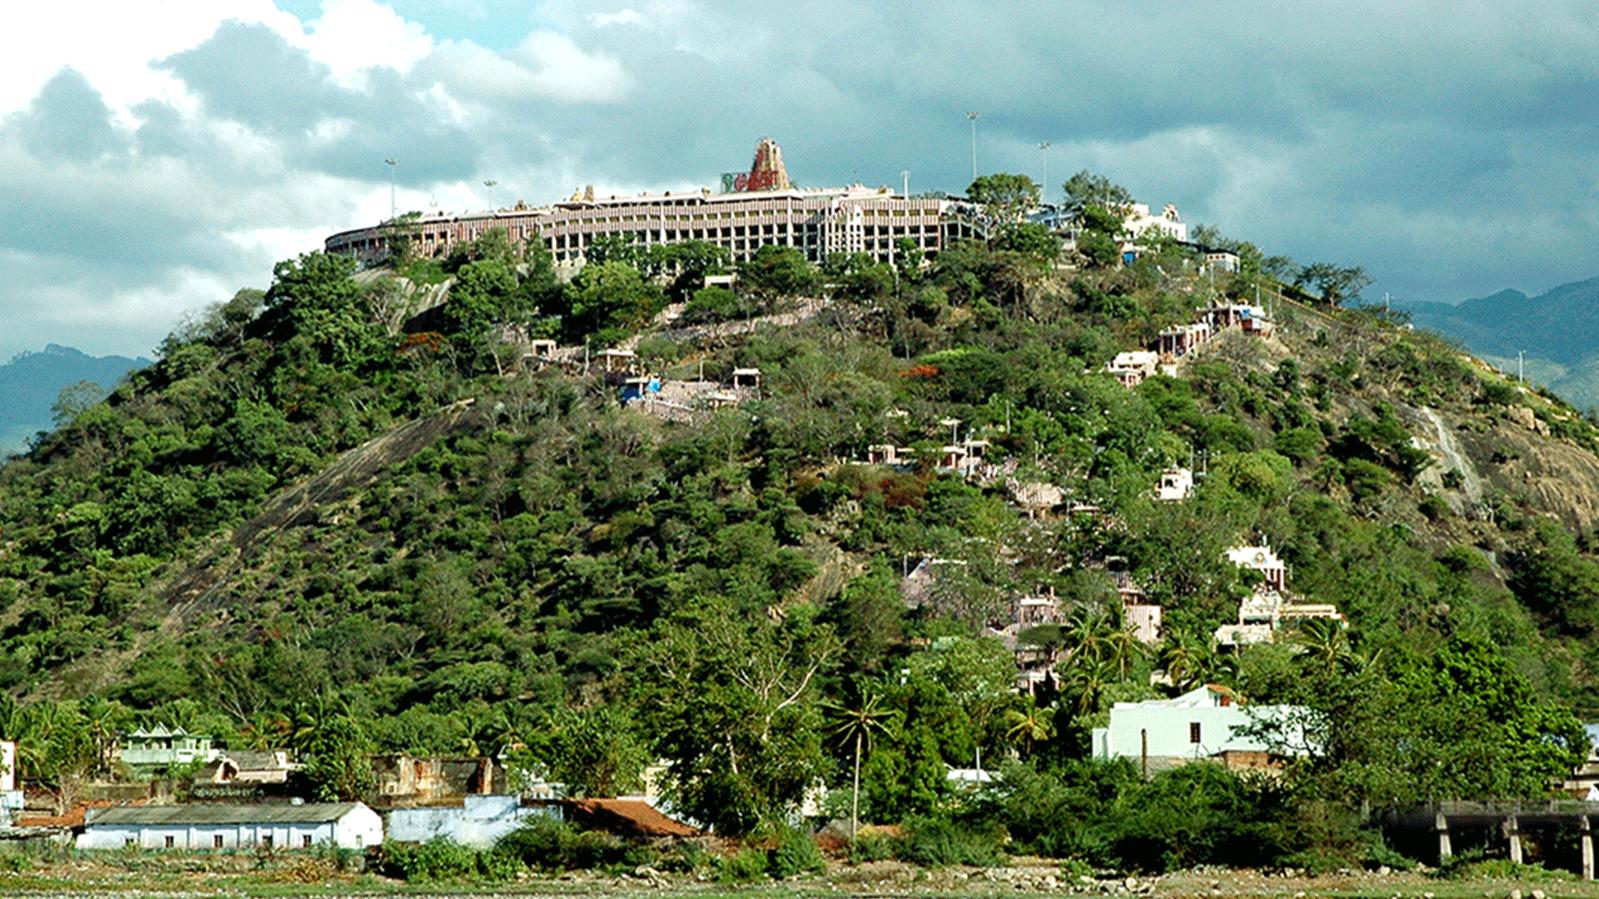 Coimbatore-Palani-Coimbatore